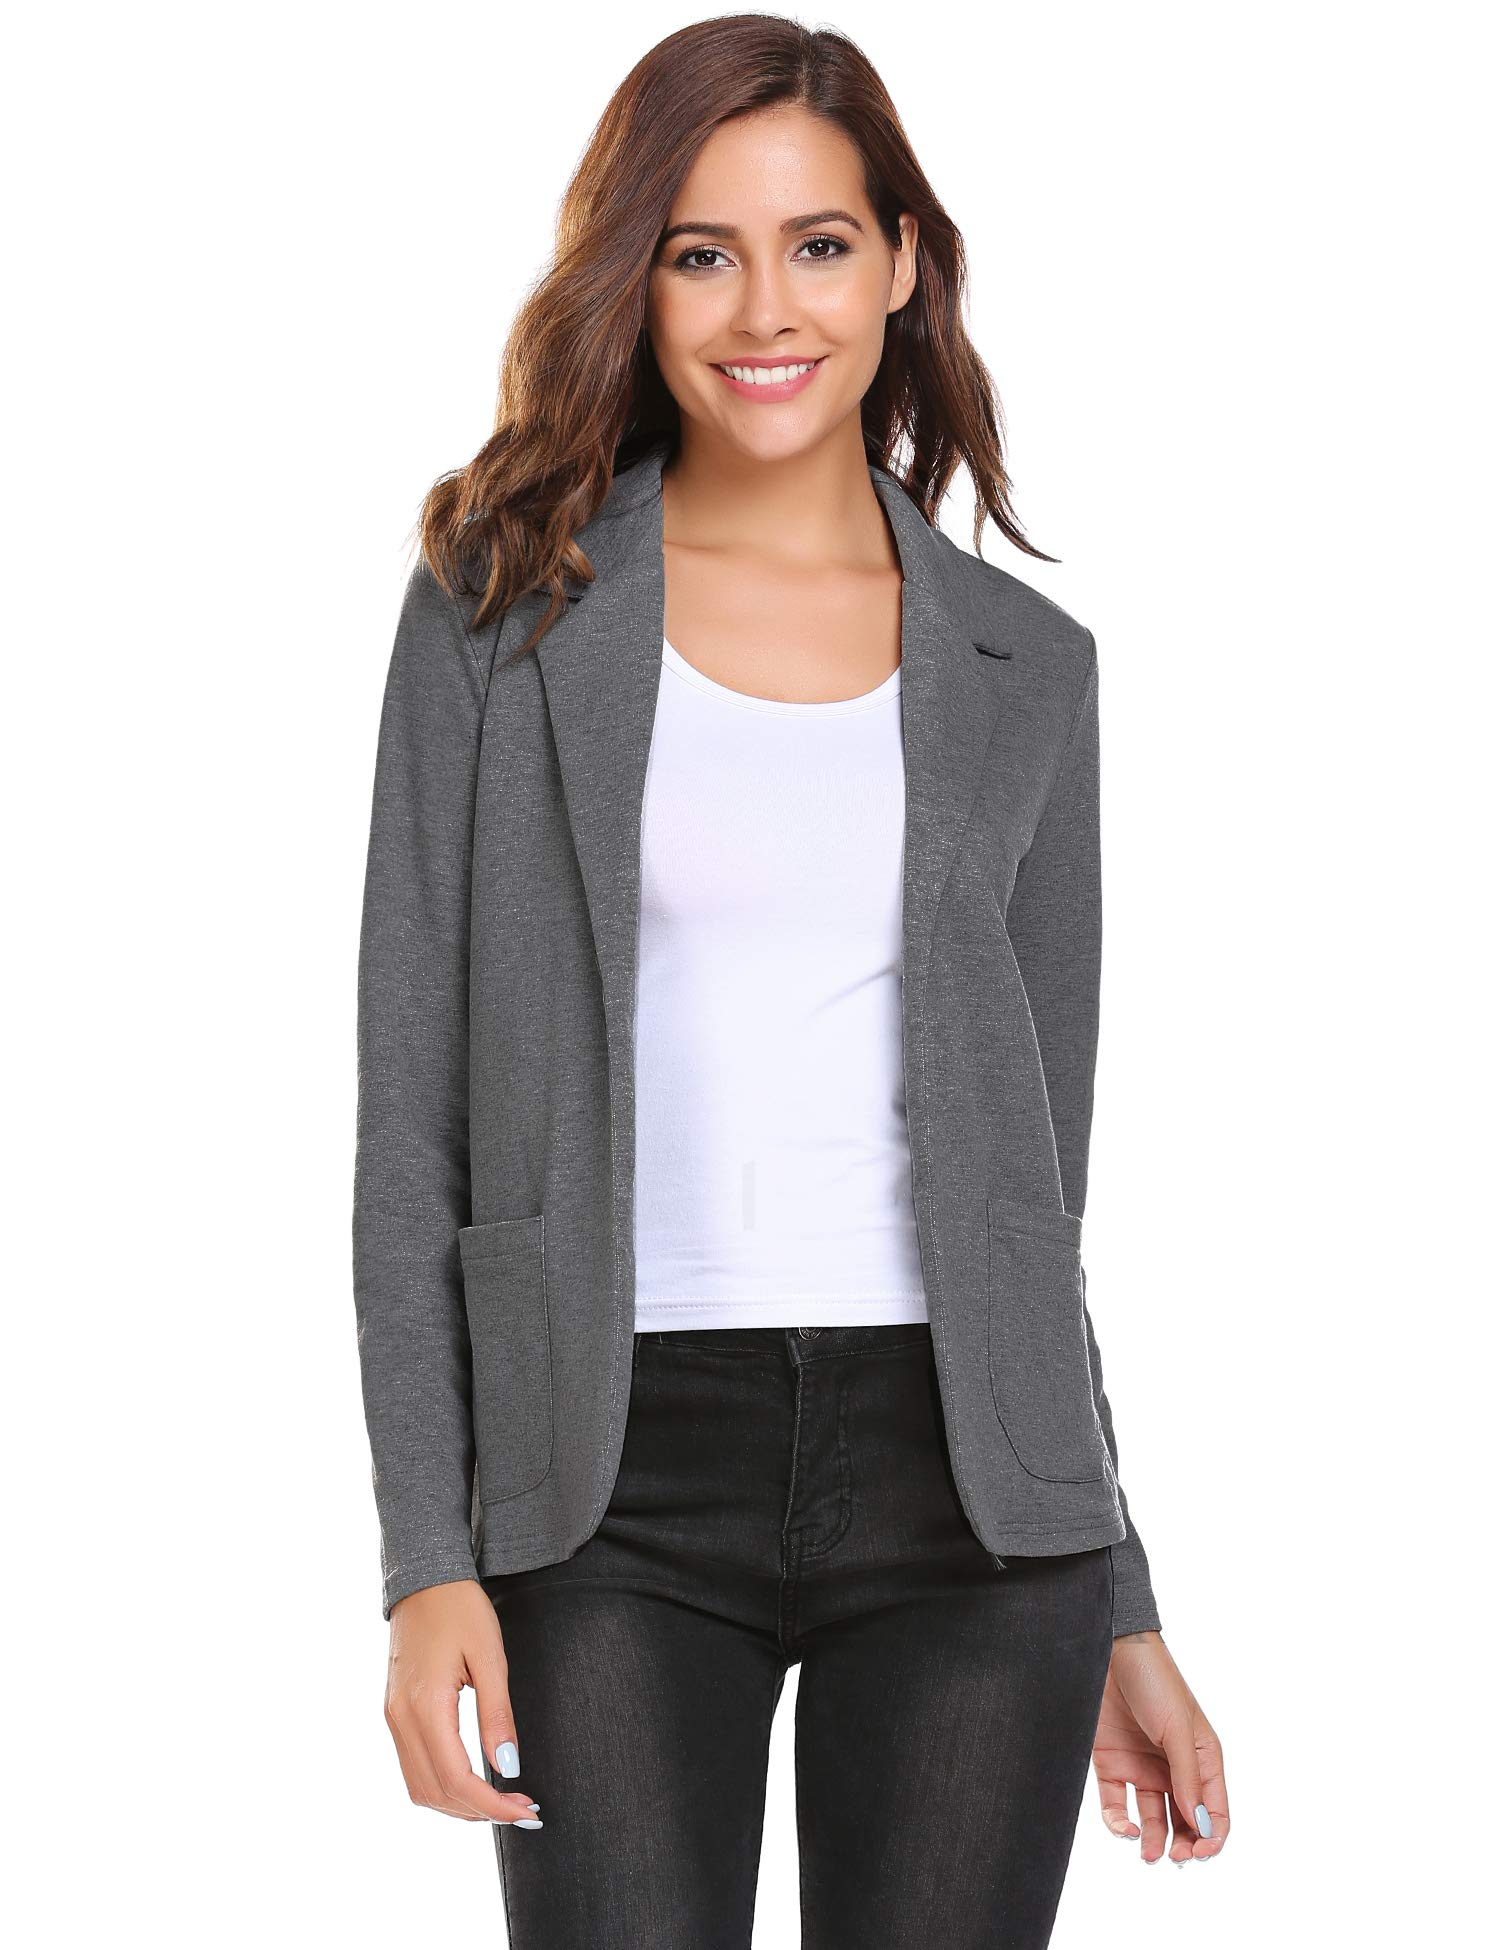 Bifast Women's Long Sleeve Open Front Blazer Oversized Gray XXL Business Carrer